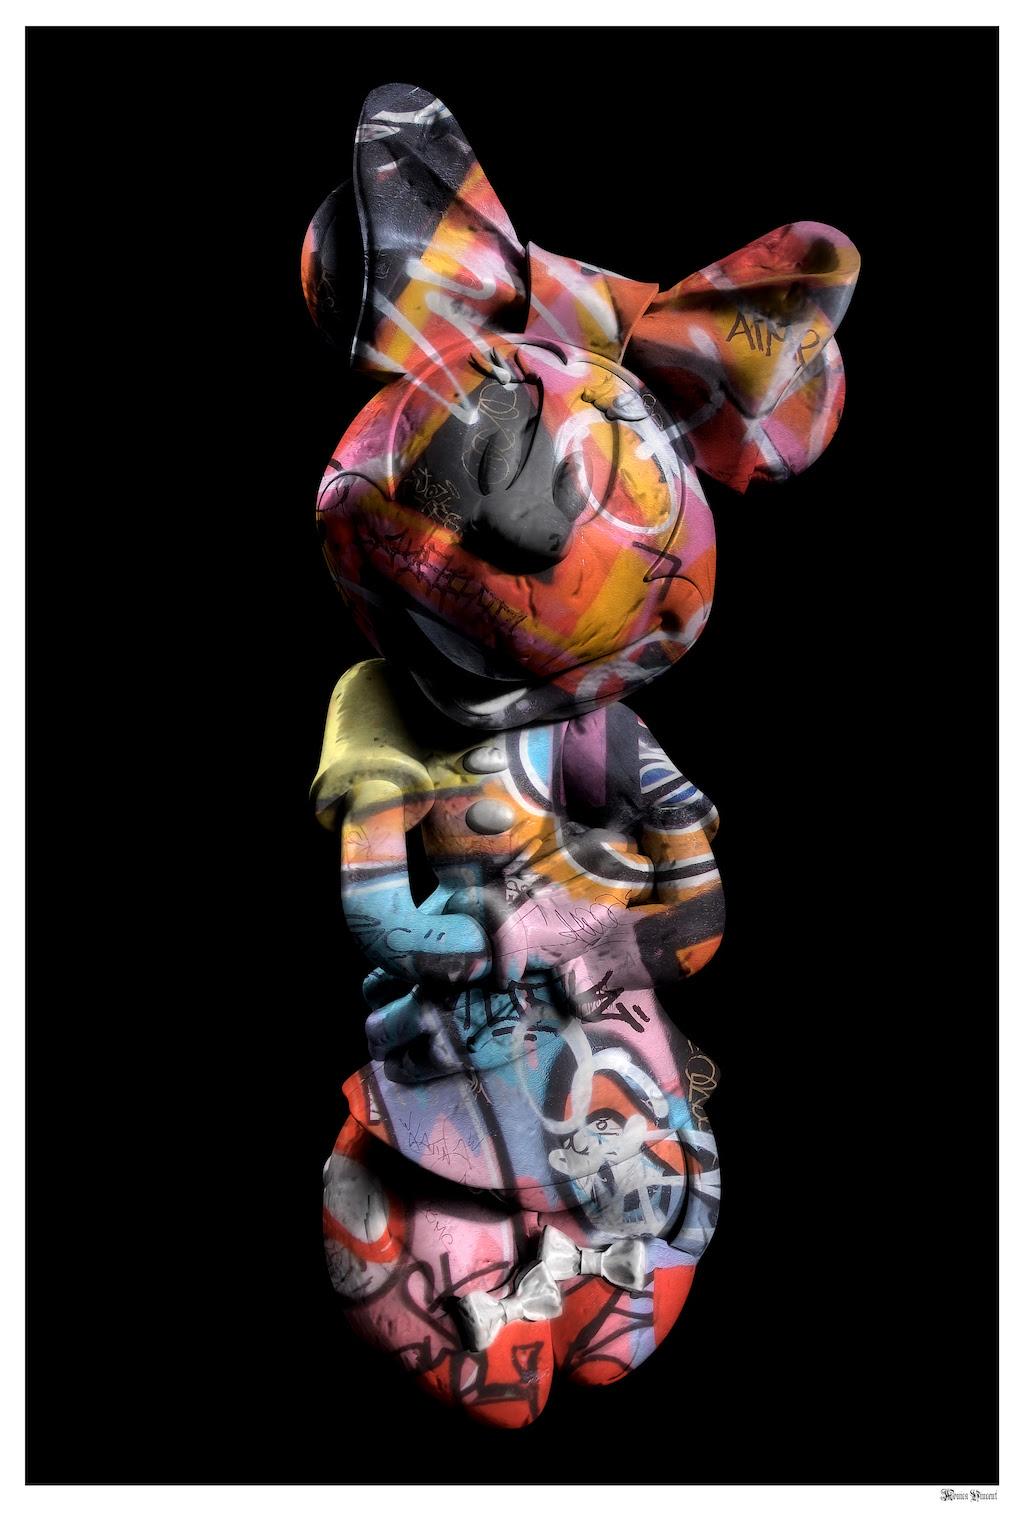 Graffiti Minnie (Black Background) - Large  by Monica Vincent